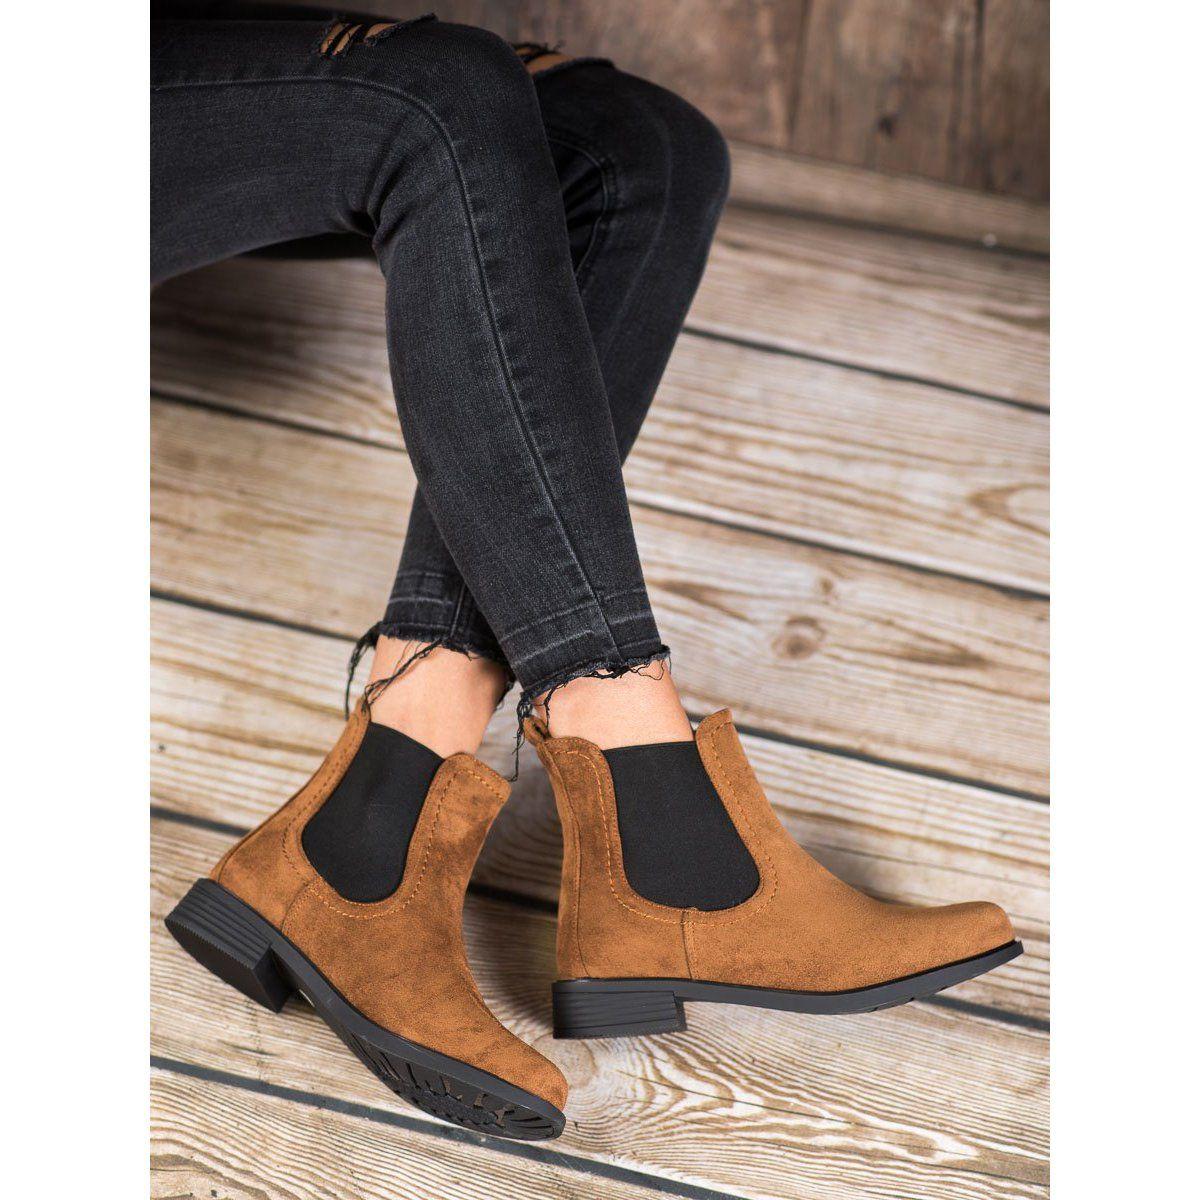 Ideal Shoes Casualowe Sztyblety Brazowe Jodhpur Boots Boots Brown Boots